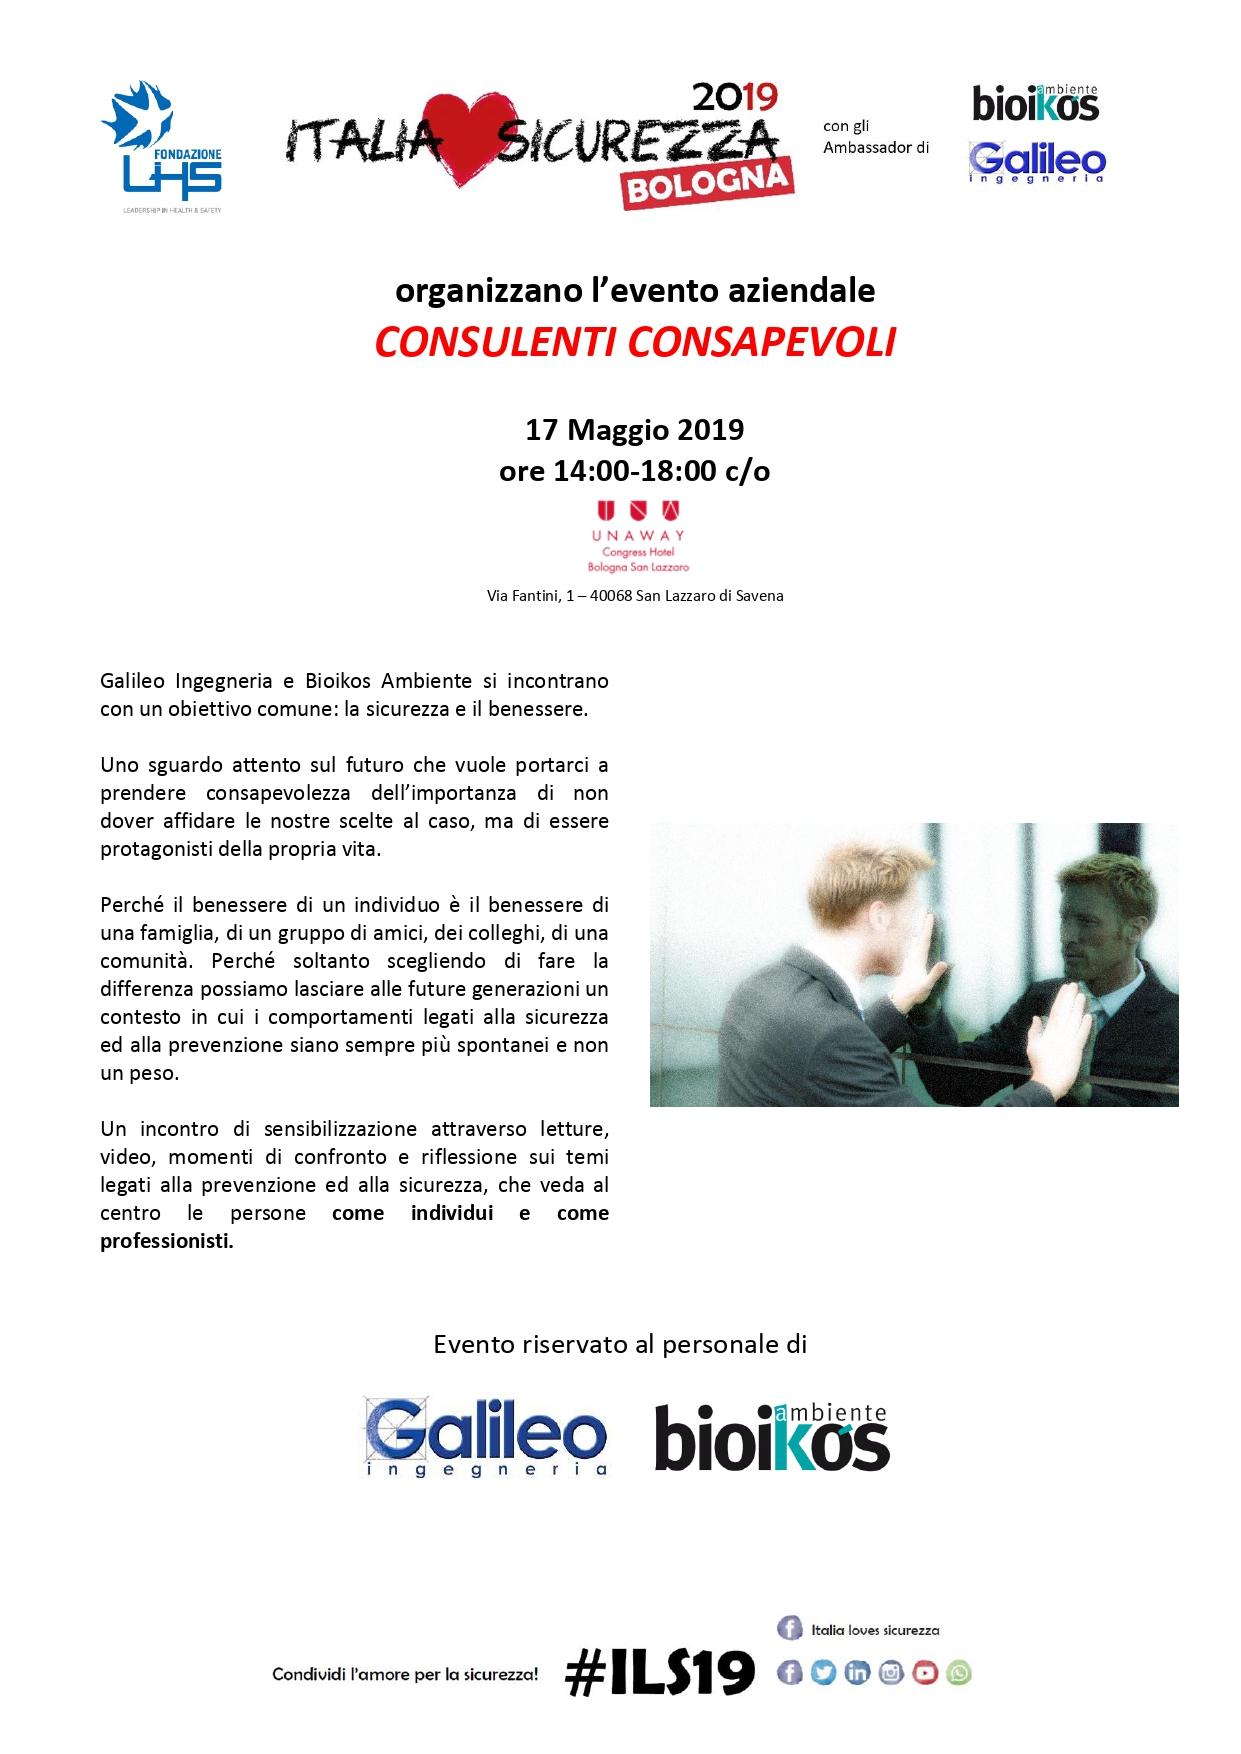 https://www.fondlhs.org/wp-content/uploads/2019/05/ILS-Consulenti-Consapevoli.jpg